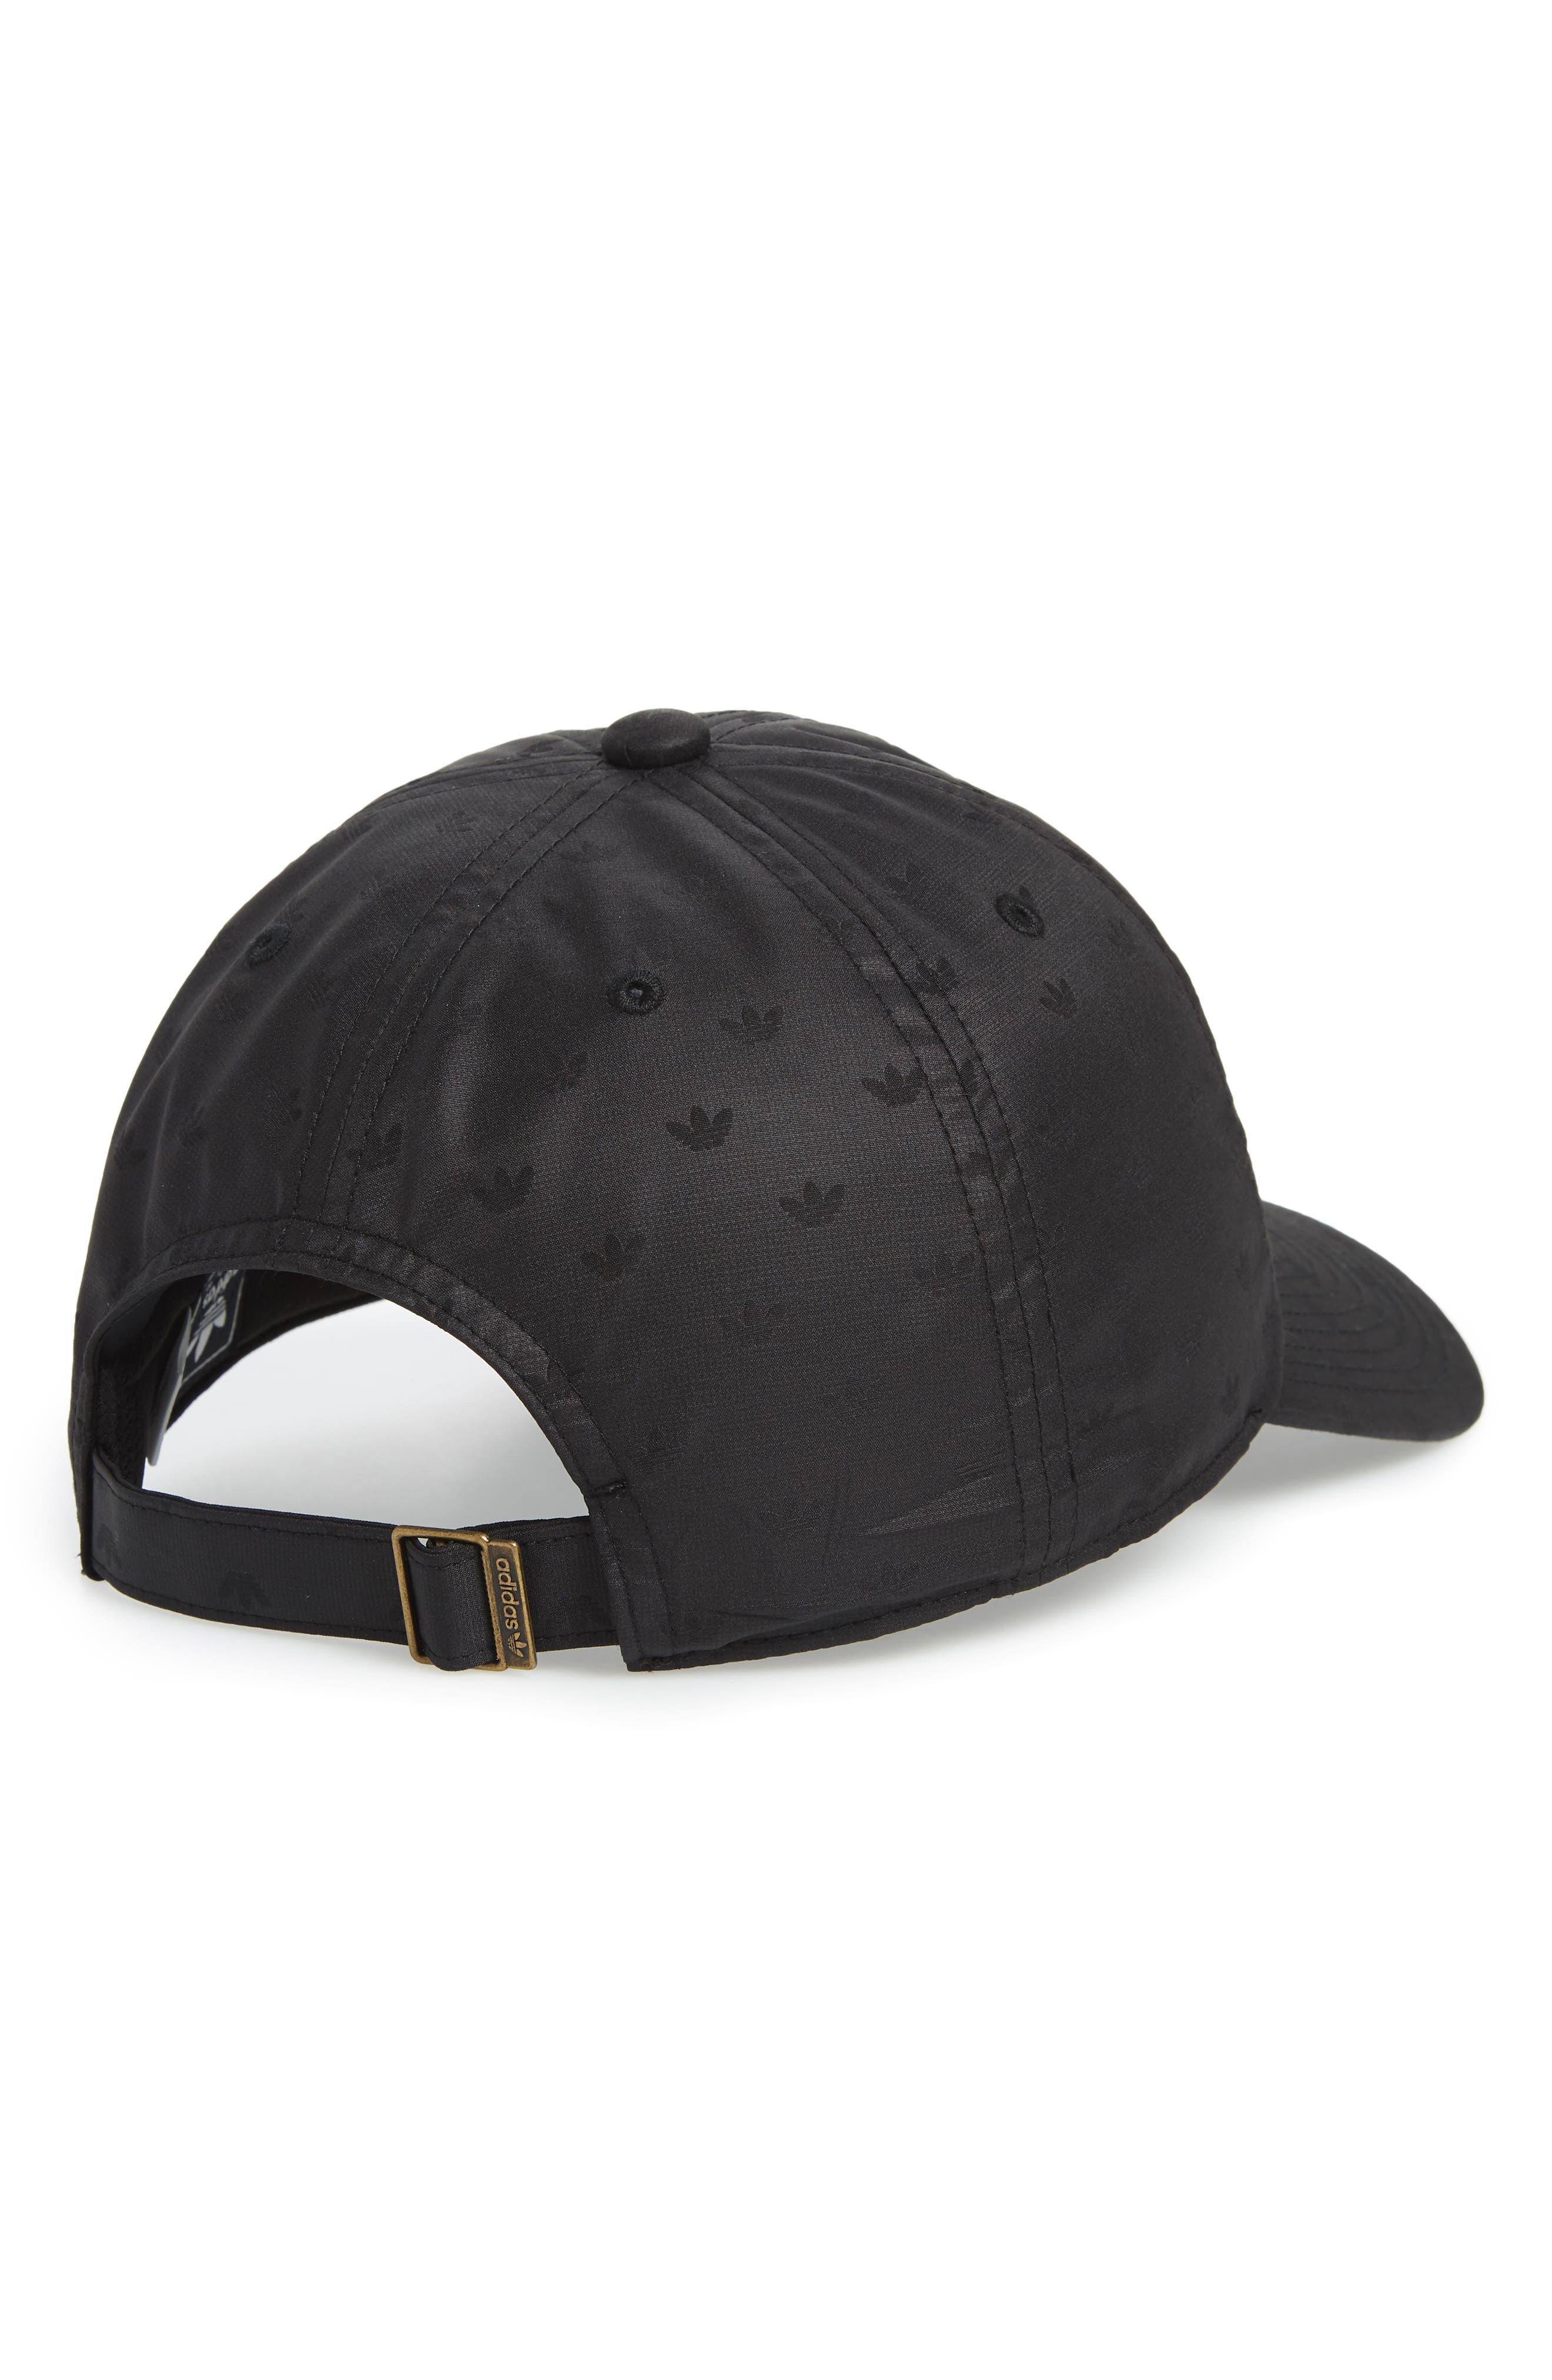 40c11720cd1 Adidas Hats for Women